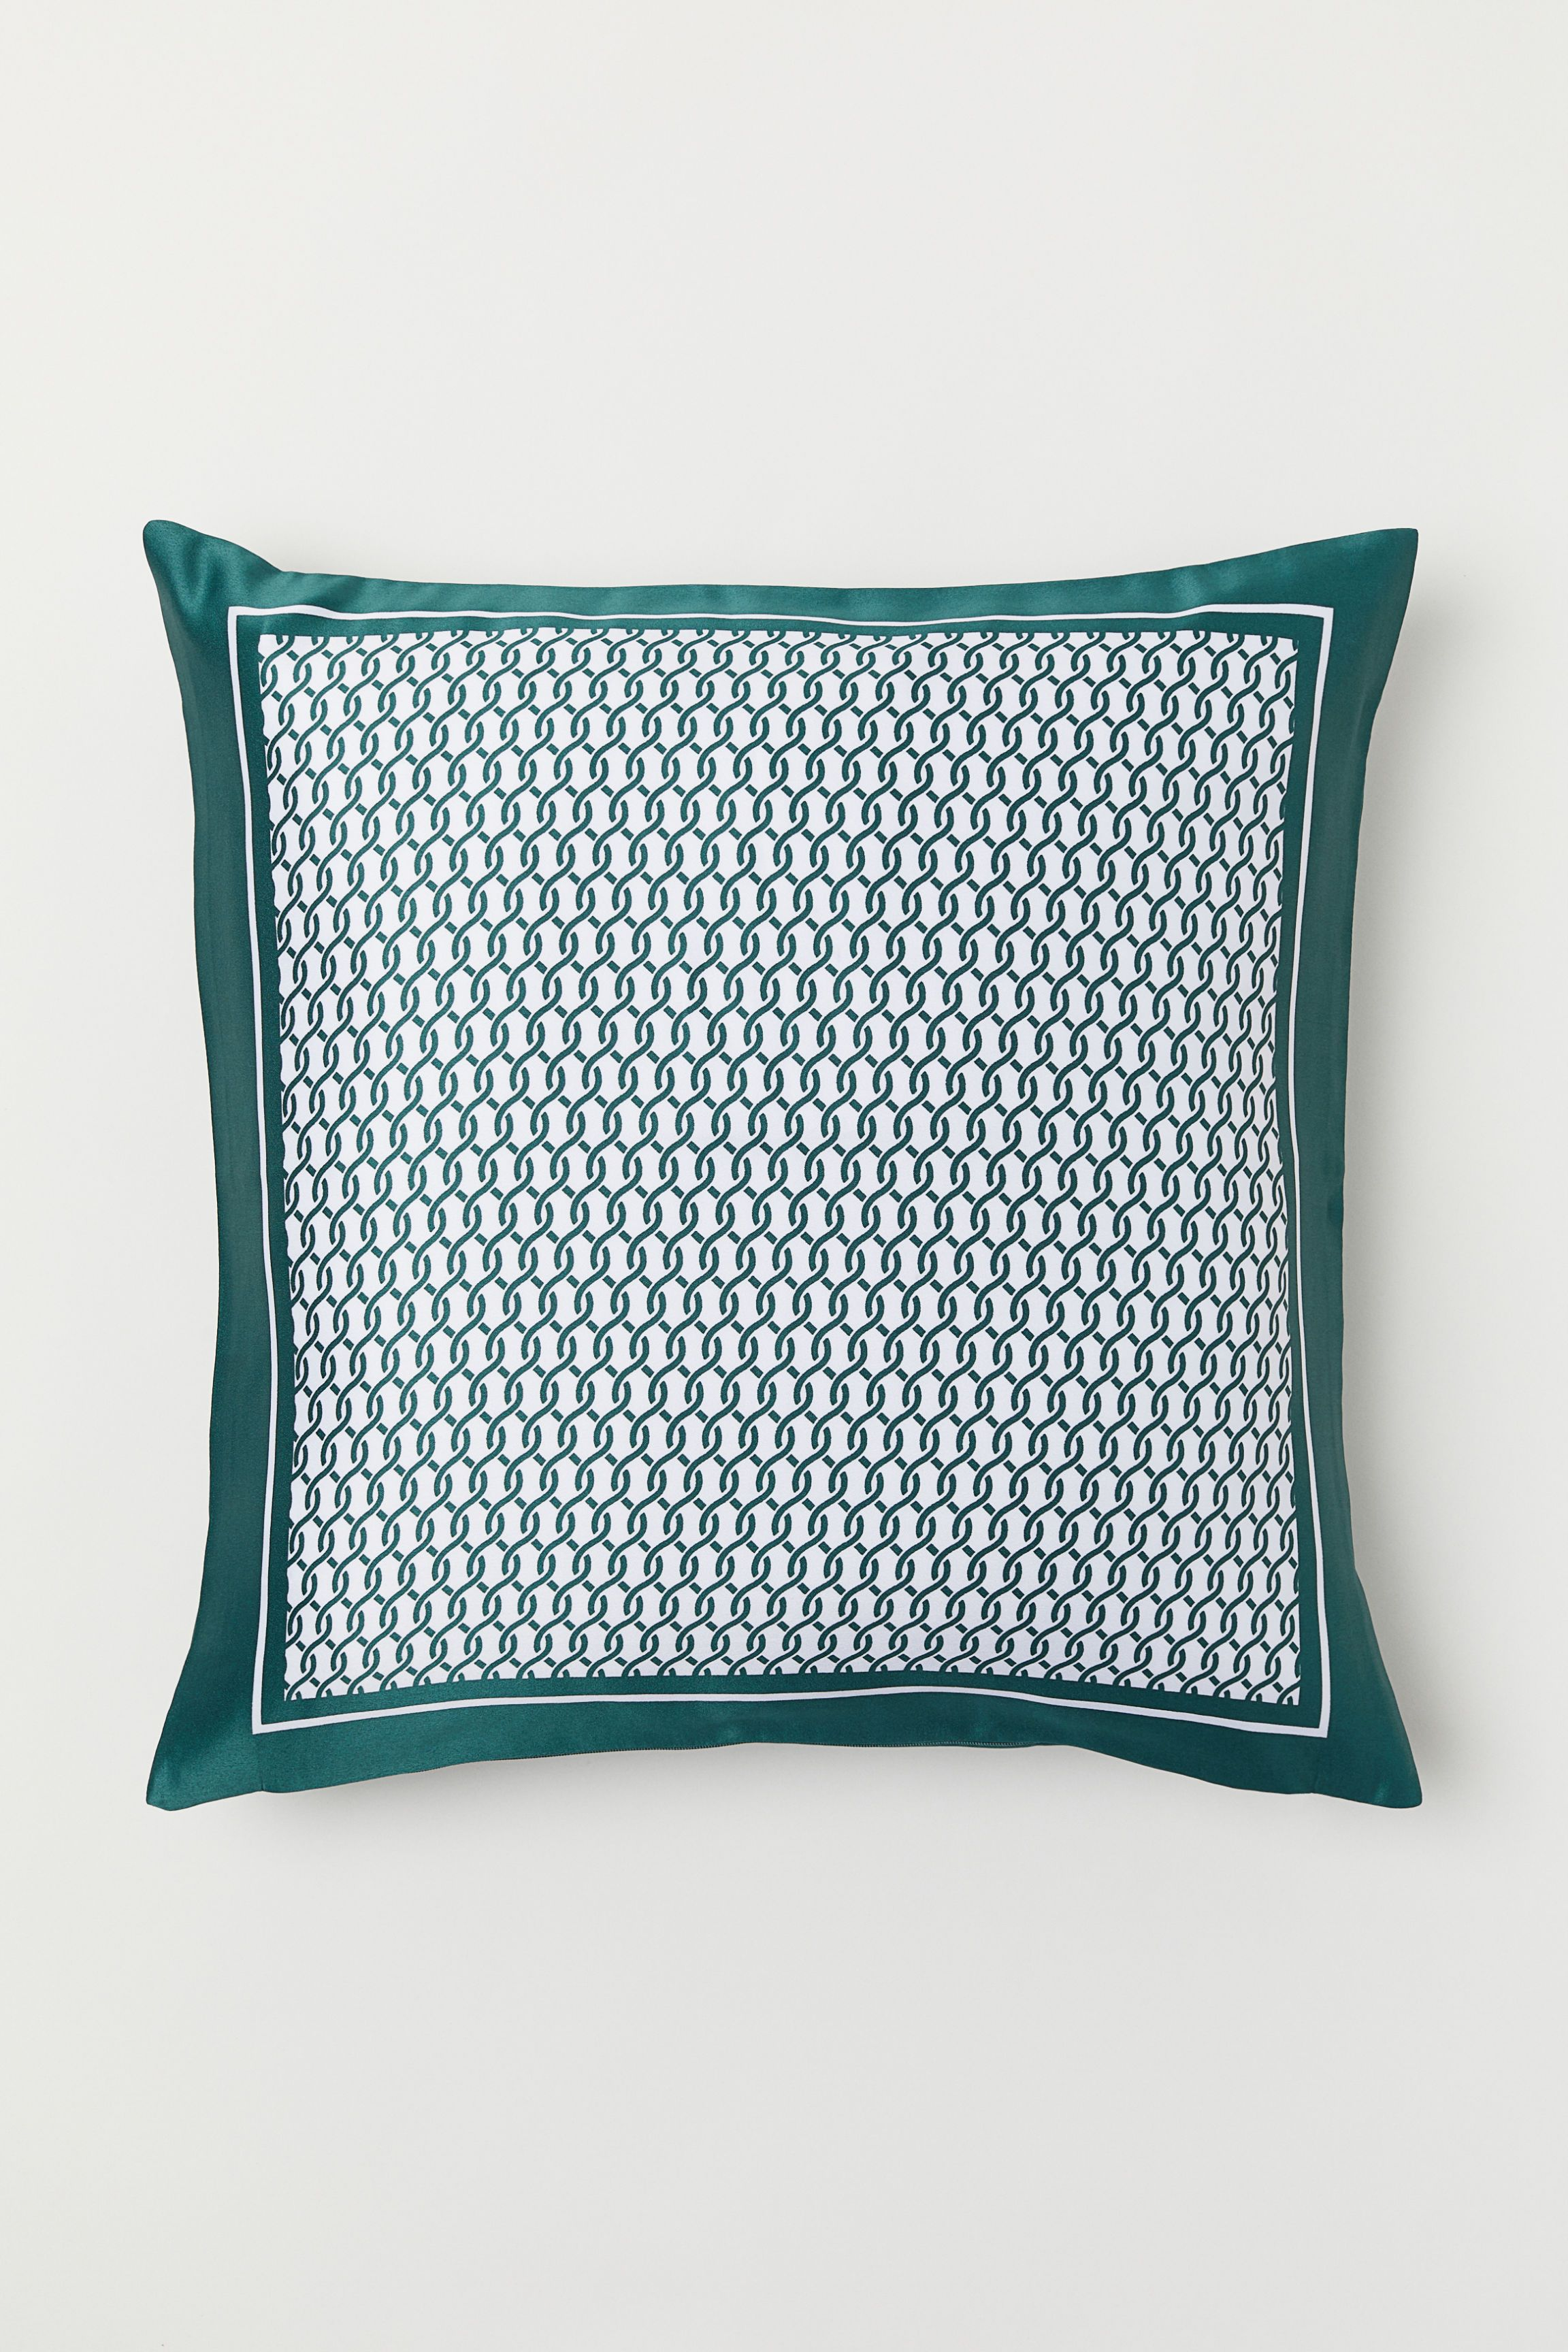 20+ Cheap Throw Pillows for Under $25   Cheap Throw Pillows